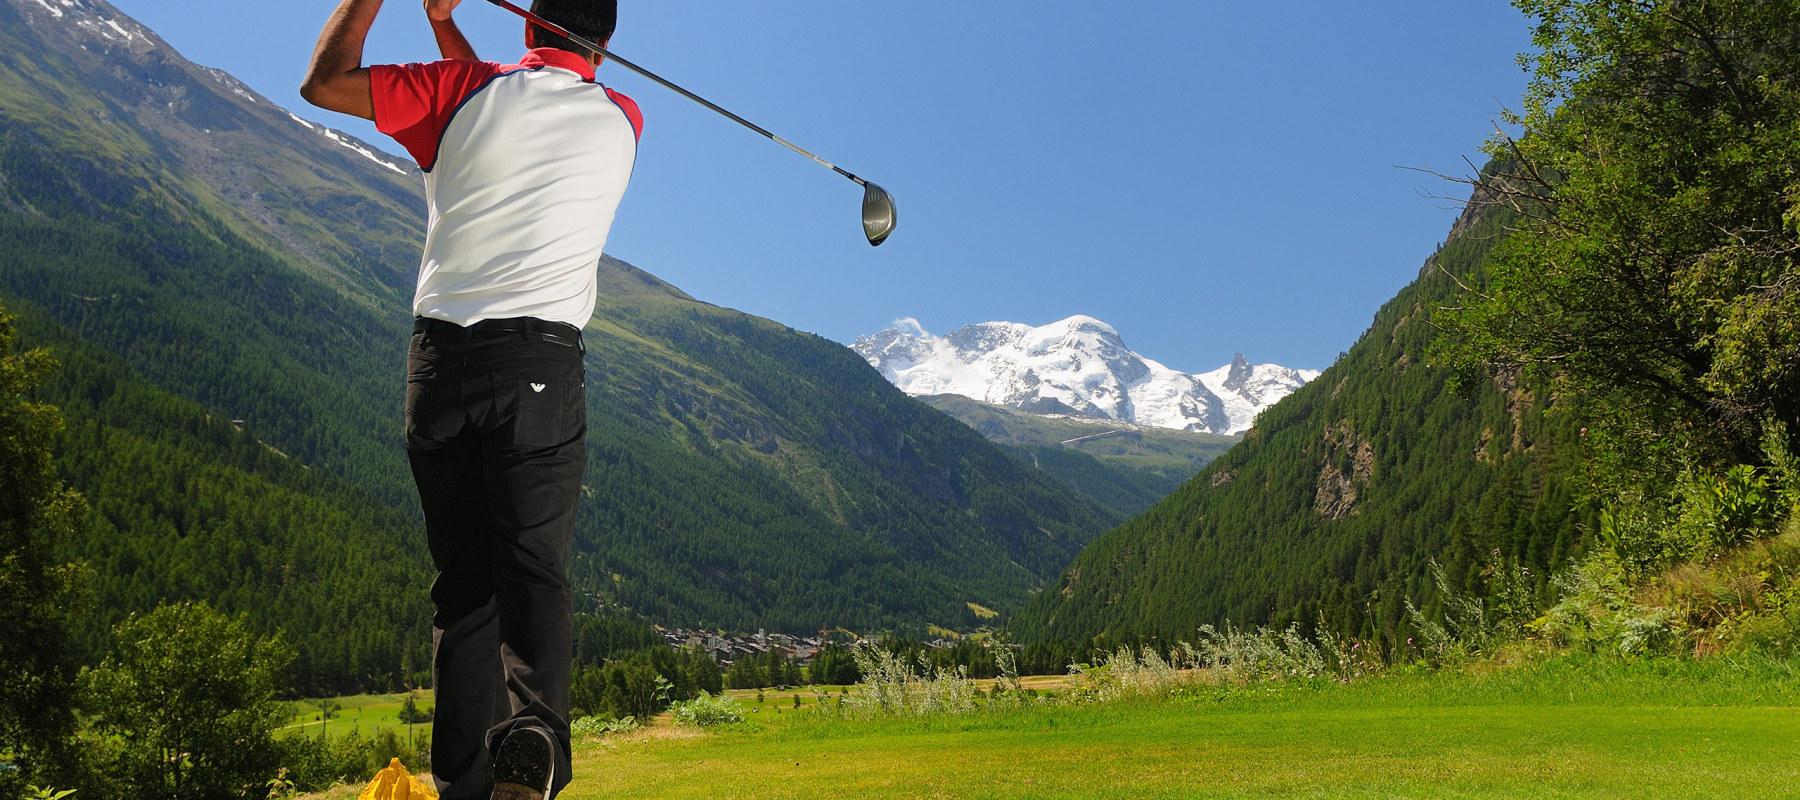 chalet-zermatt-peak-26